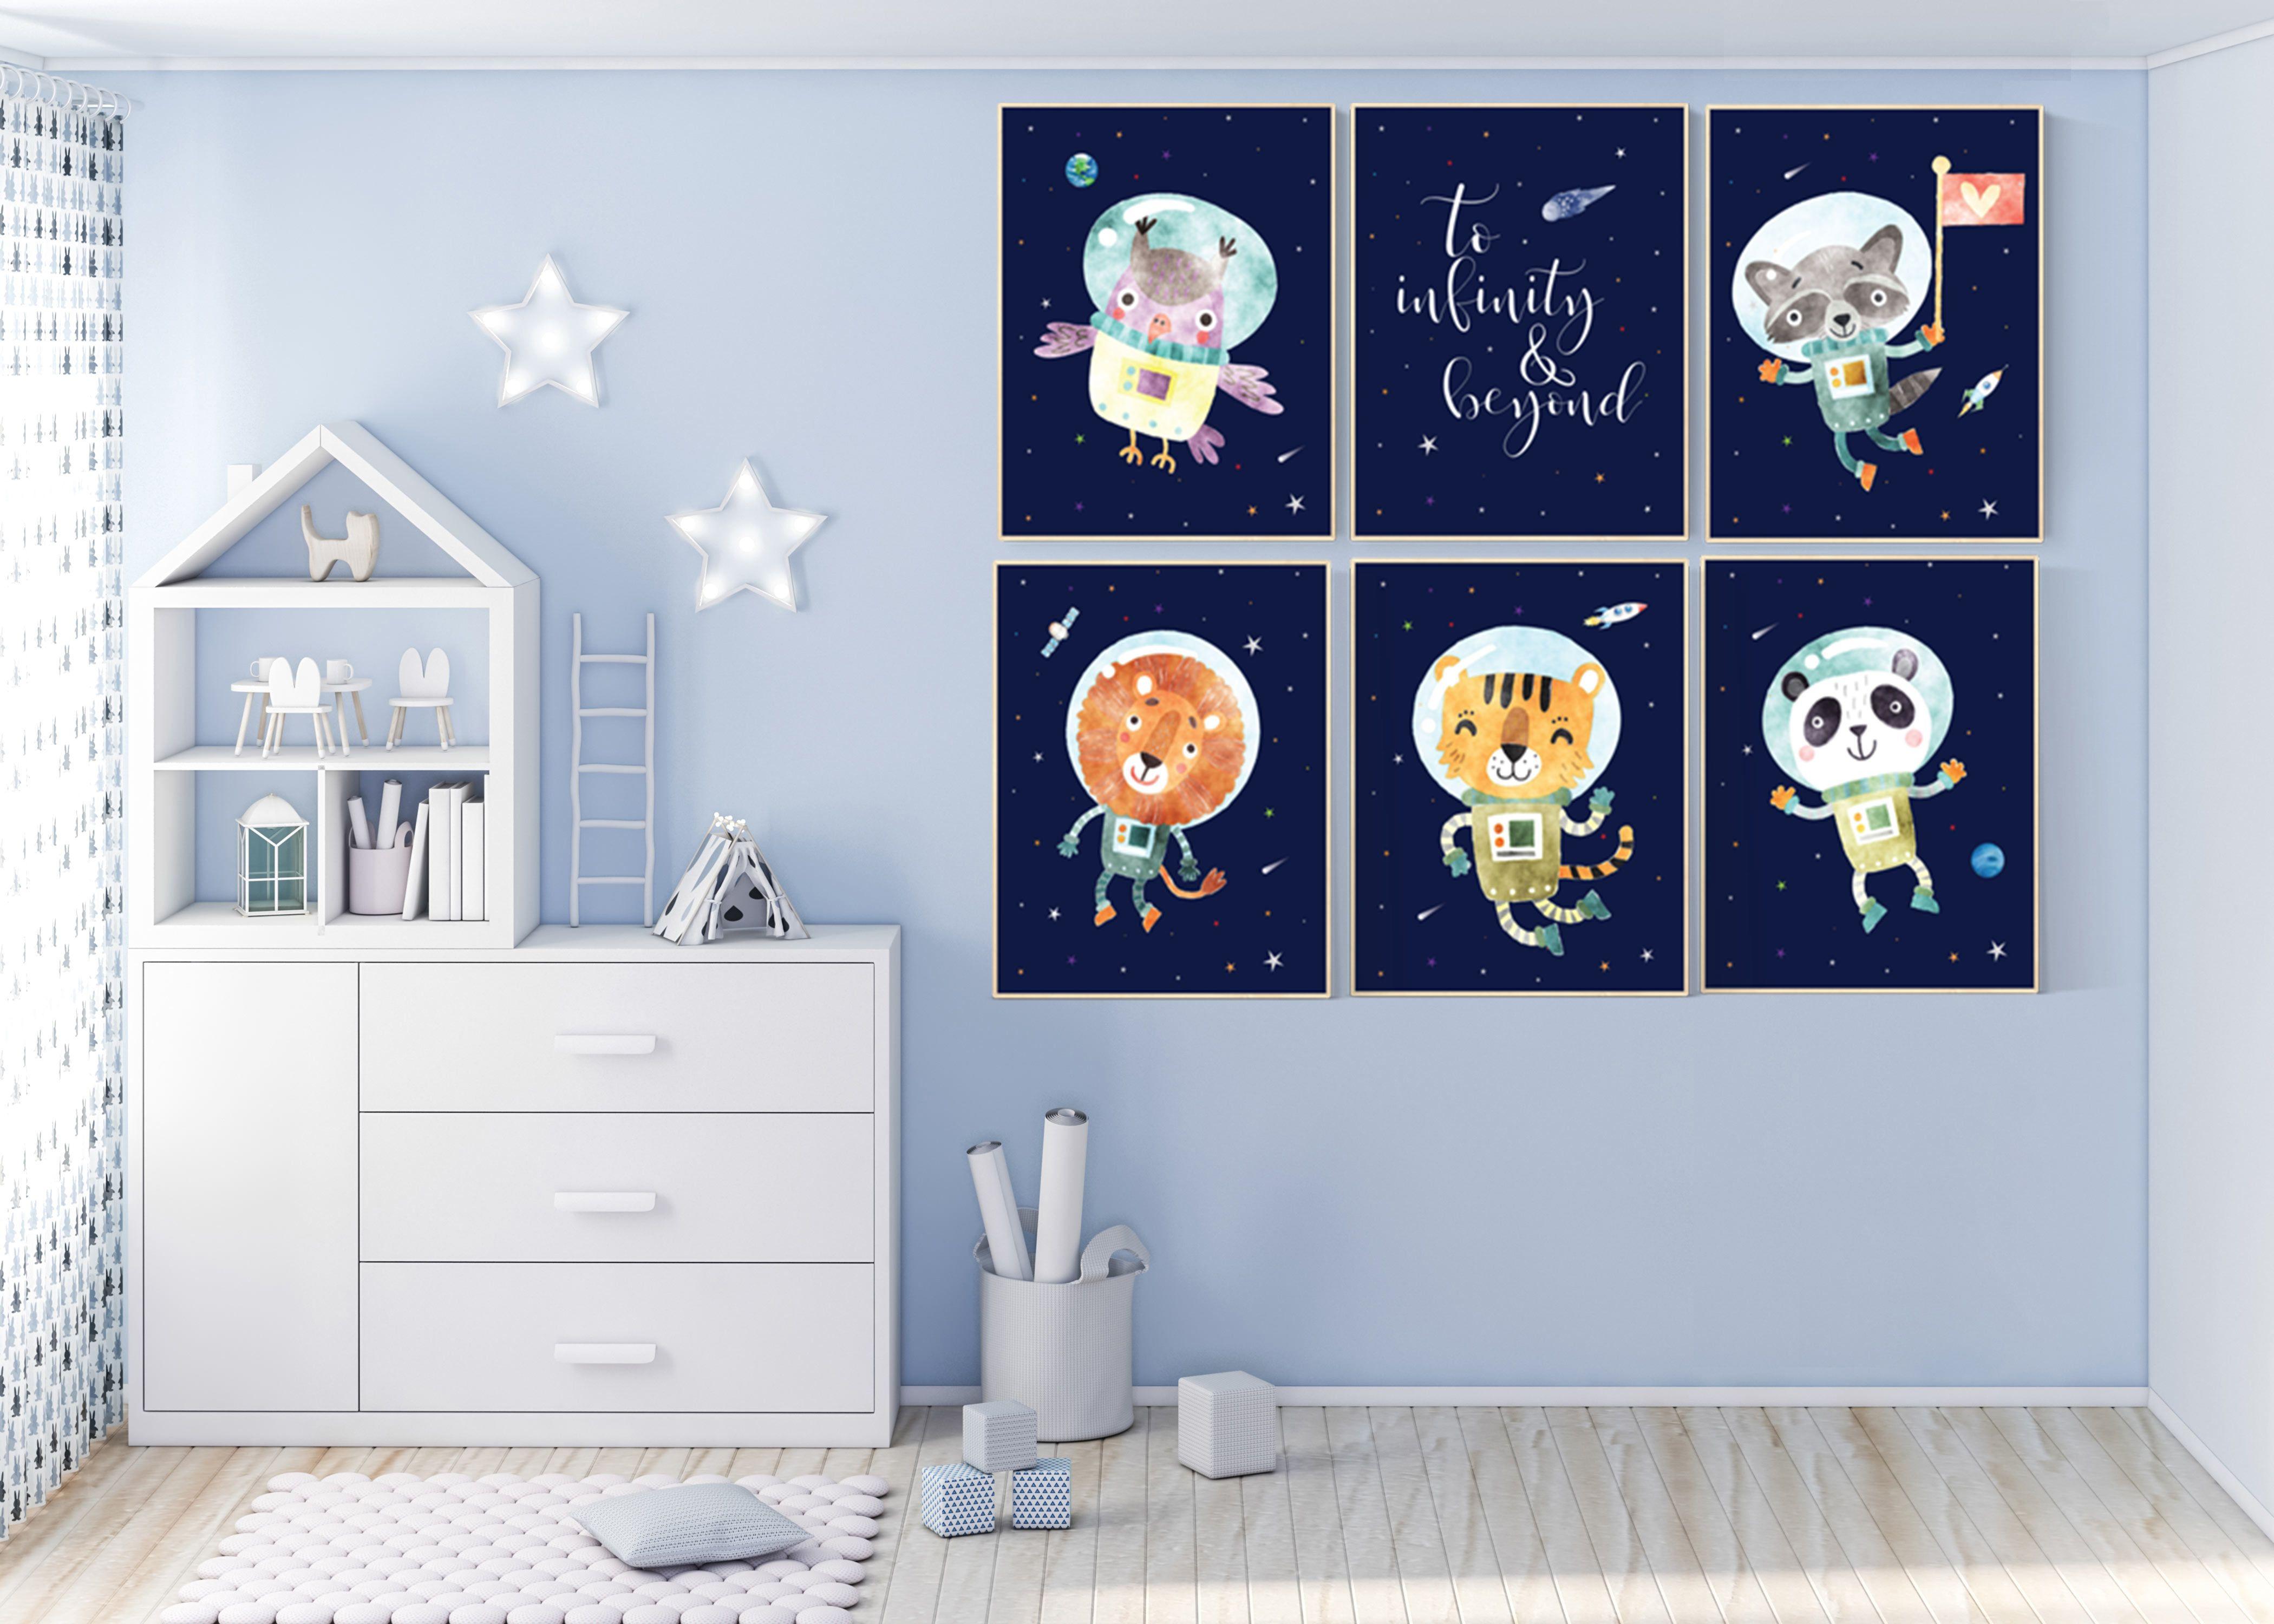 Nursery Decor Boy Space Nursery Prints Space Space Themed Etsy Outer Space Nursery Space Themed Nursery Nursery Decor Boy